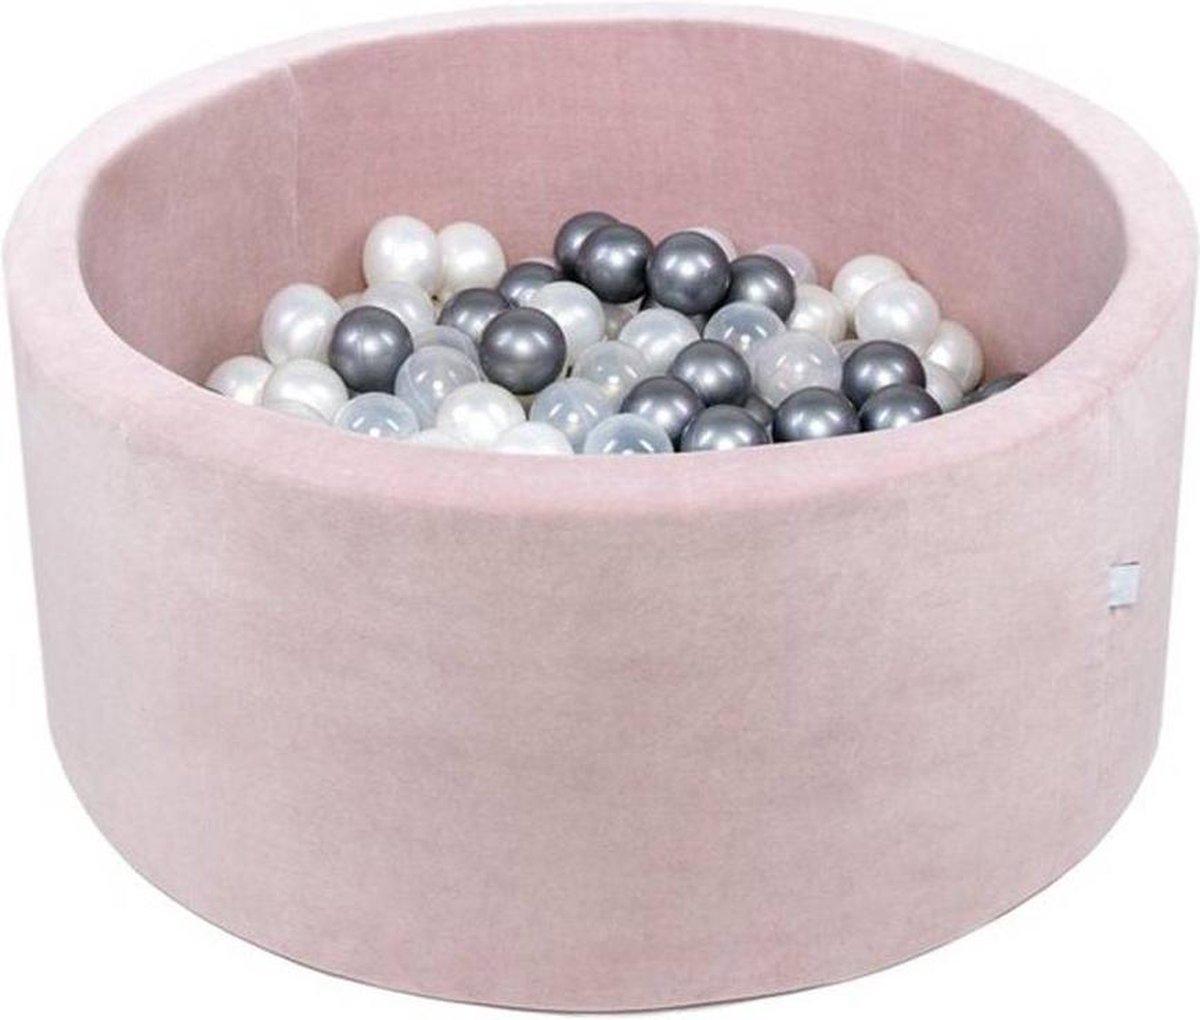 Ballenbak XL rond 90x40 velvet lichtroze Misioo, excl. ballen